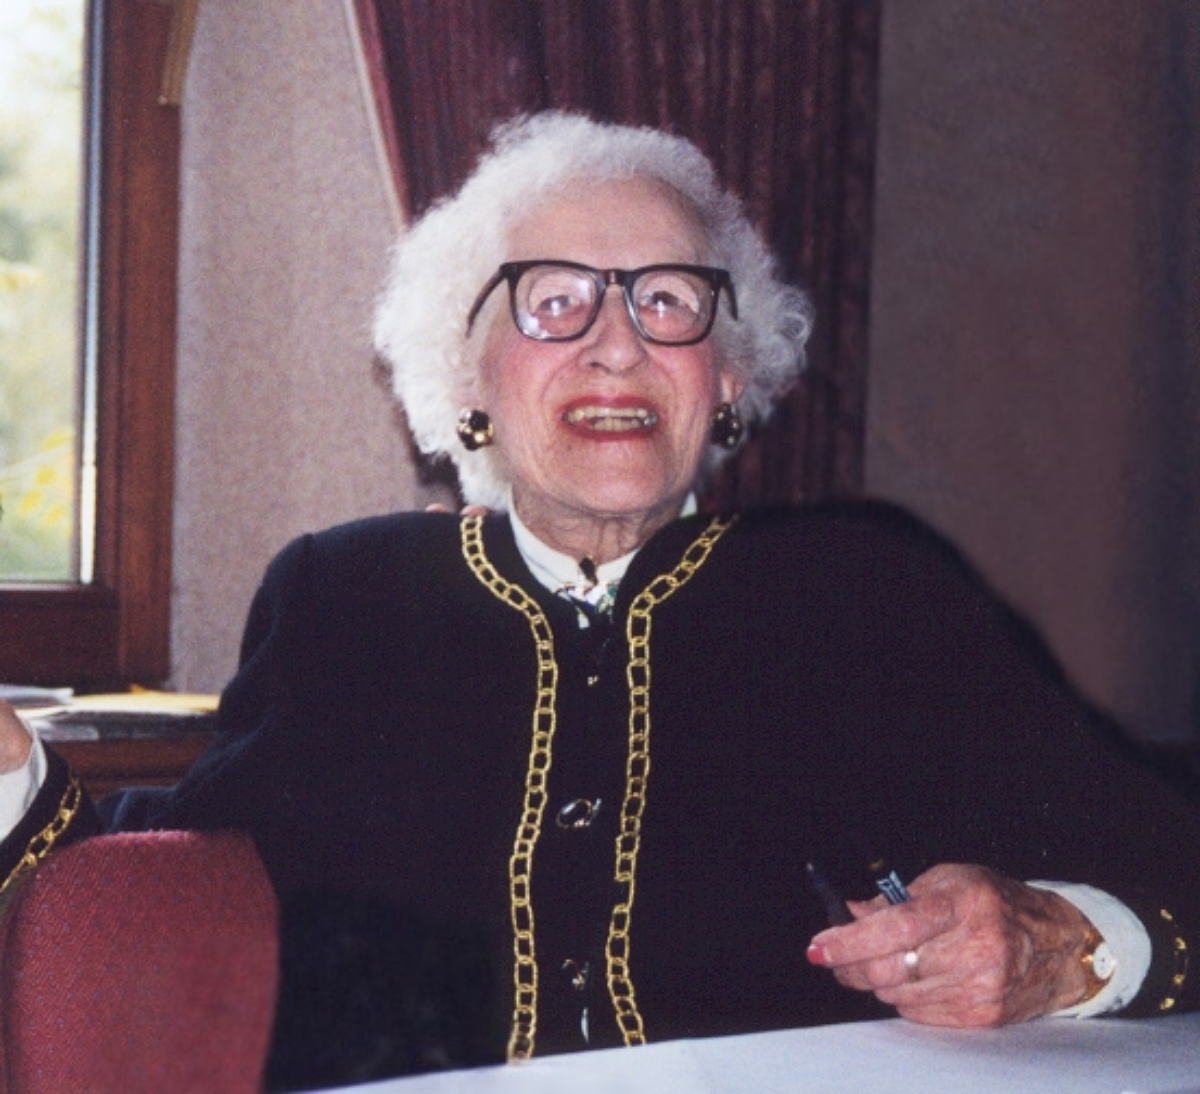 Millvina Dean in 1999